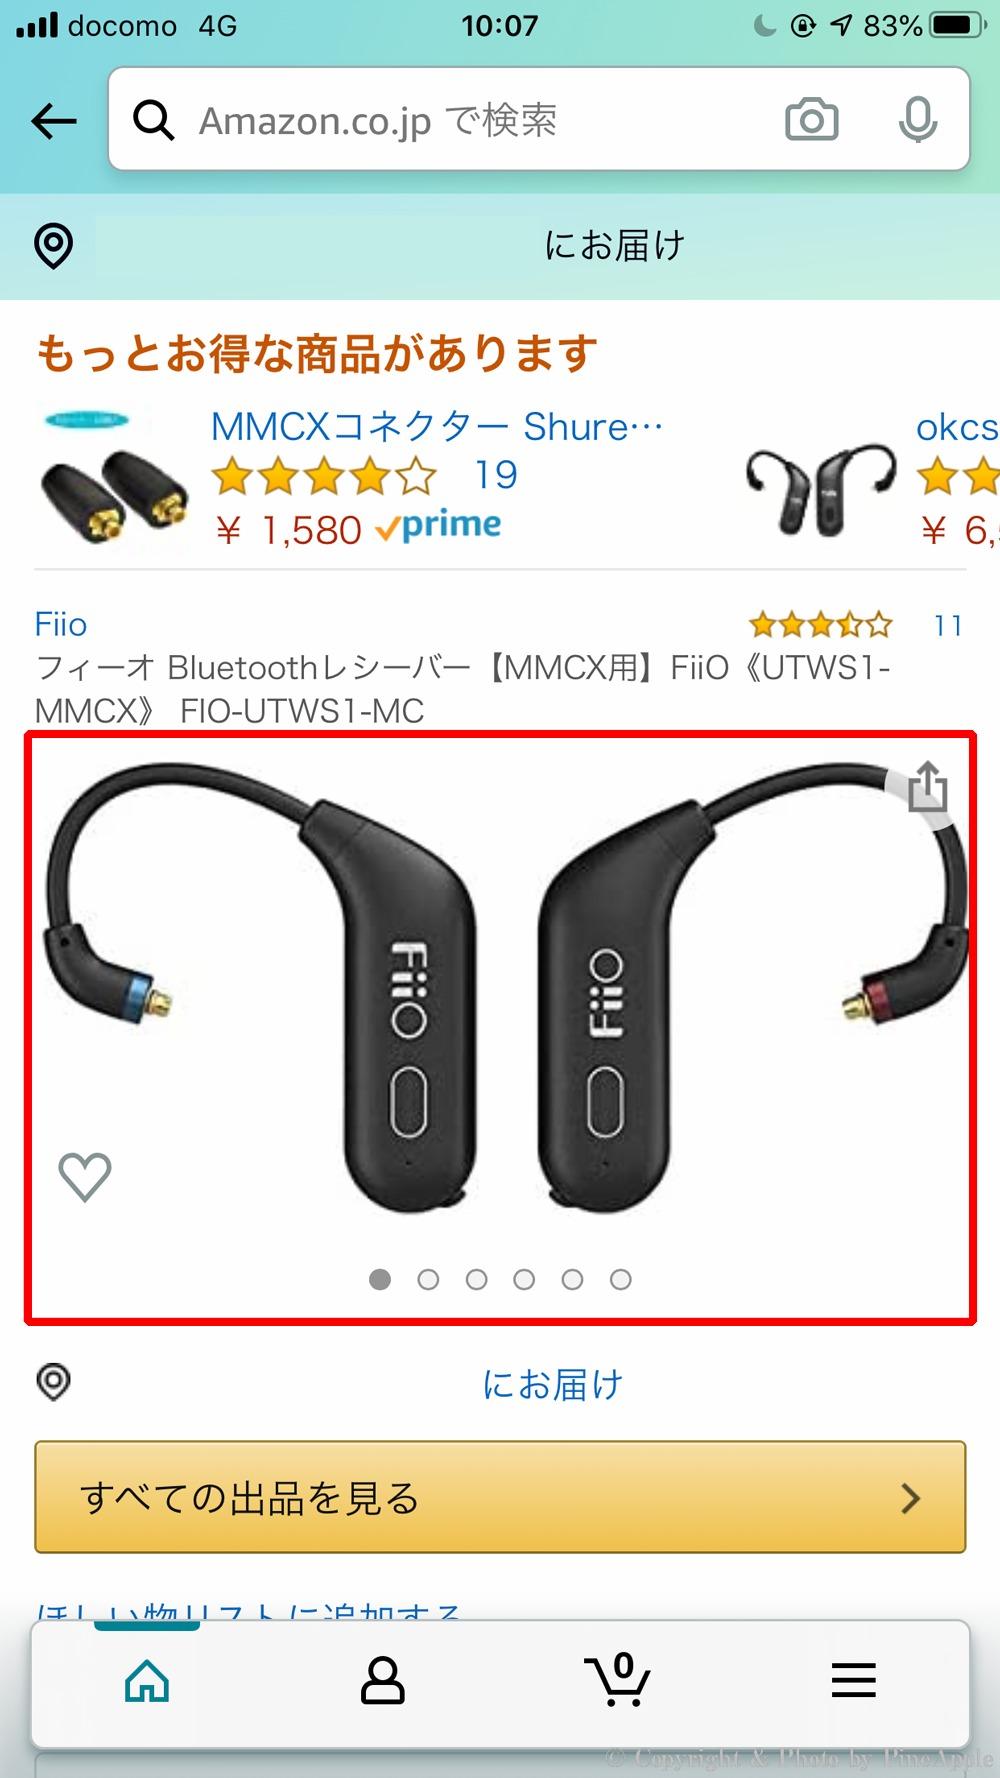 Amazon ショッピングアプリ:製品画像部分をスワイプすると製品画像のチェック